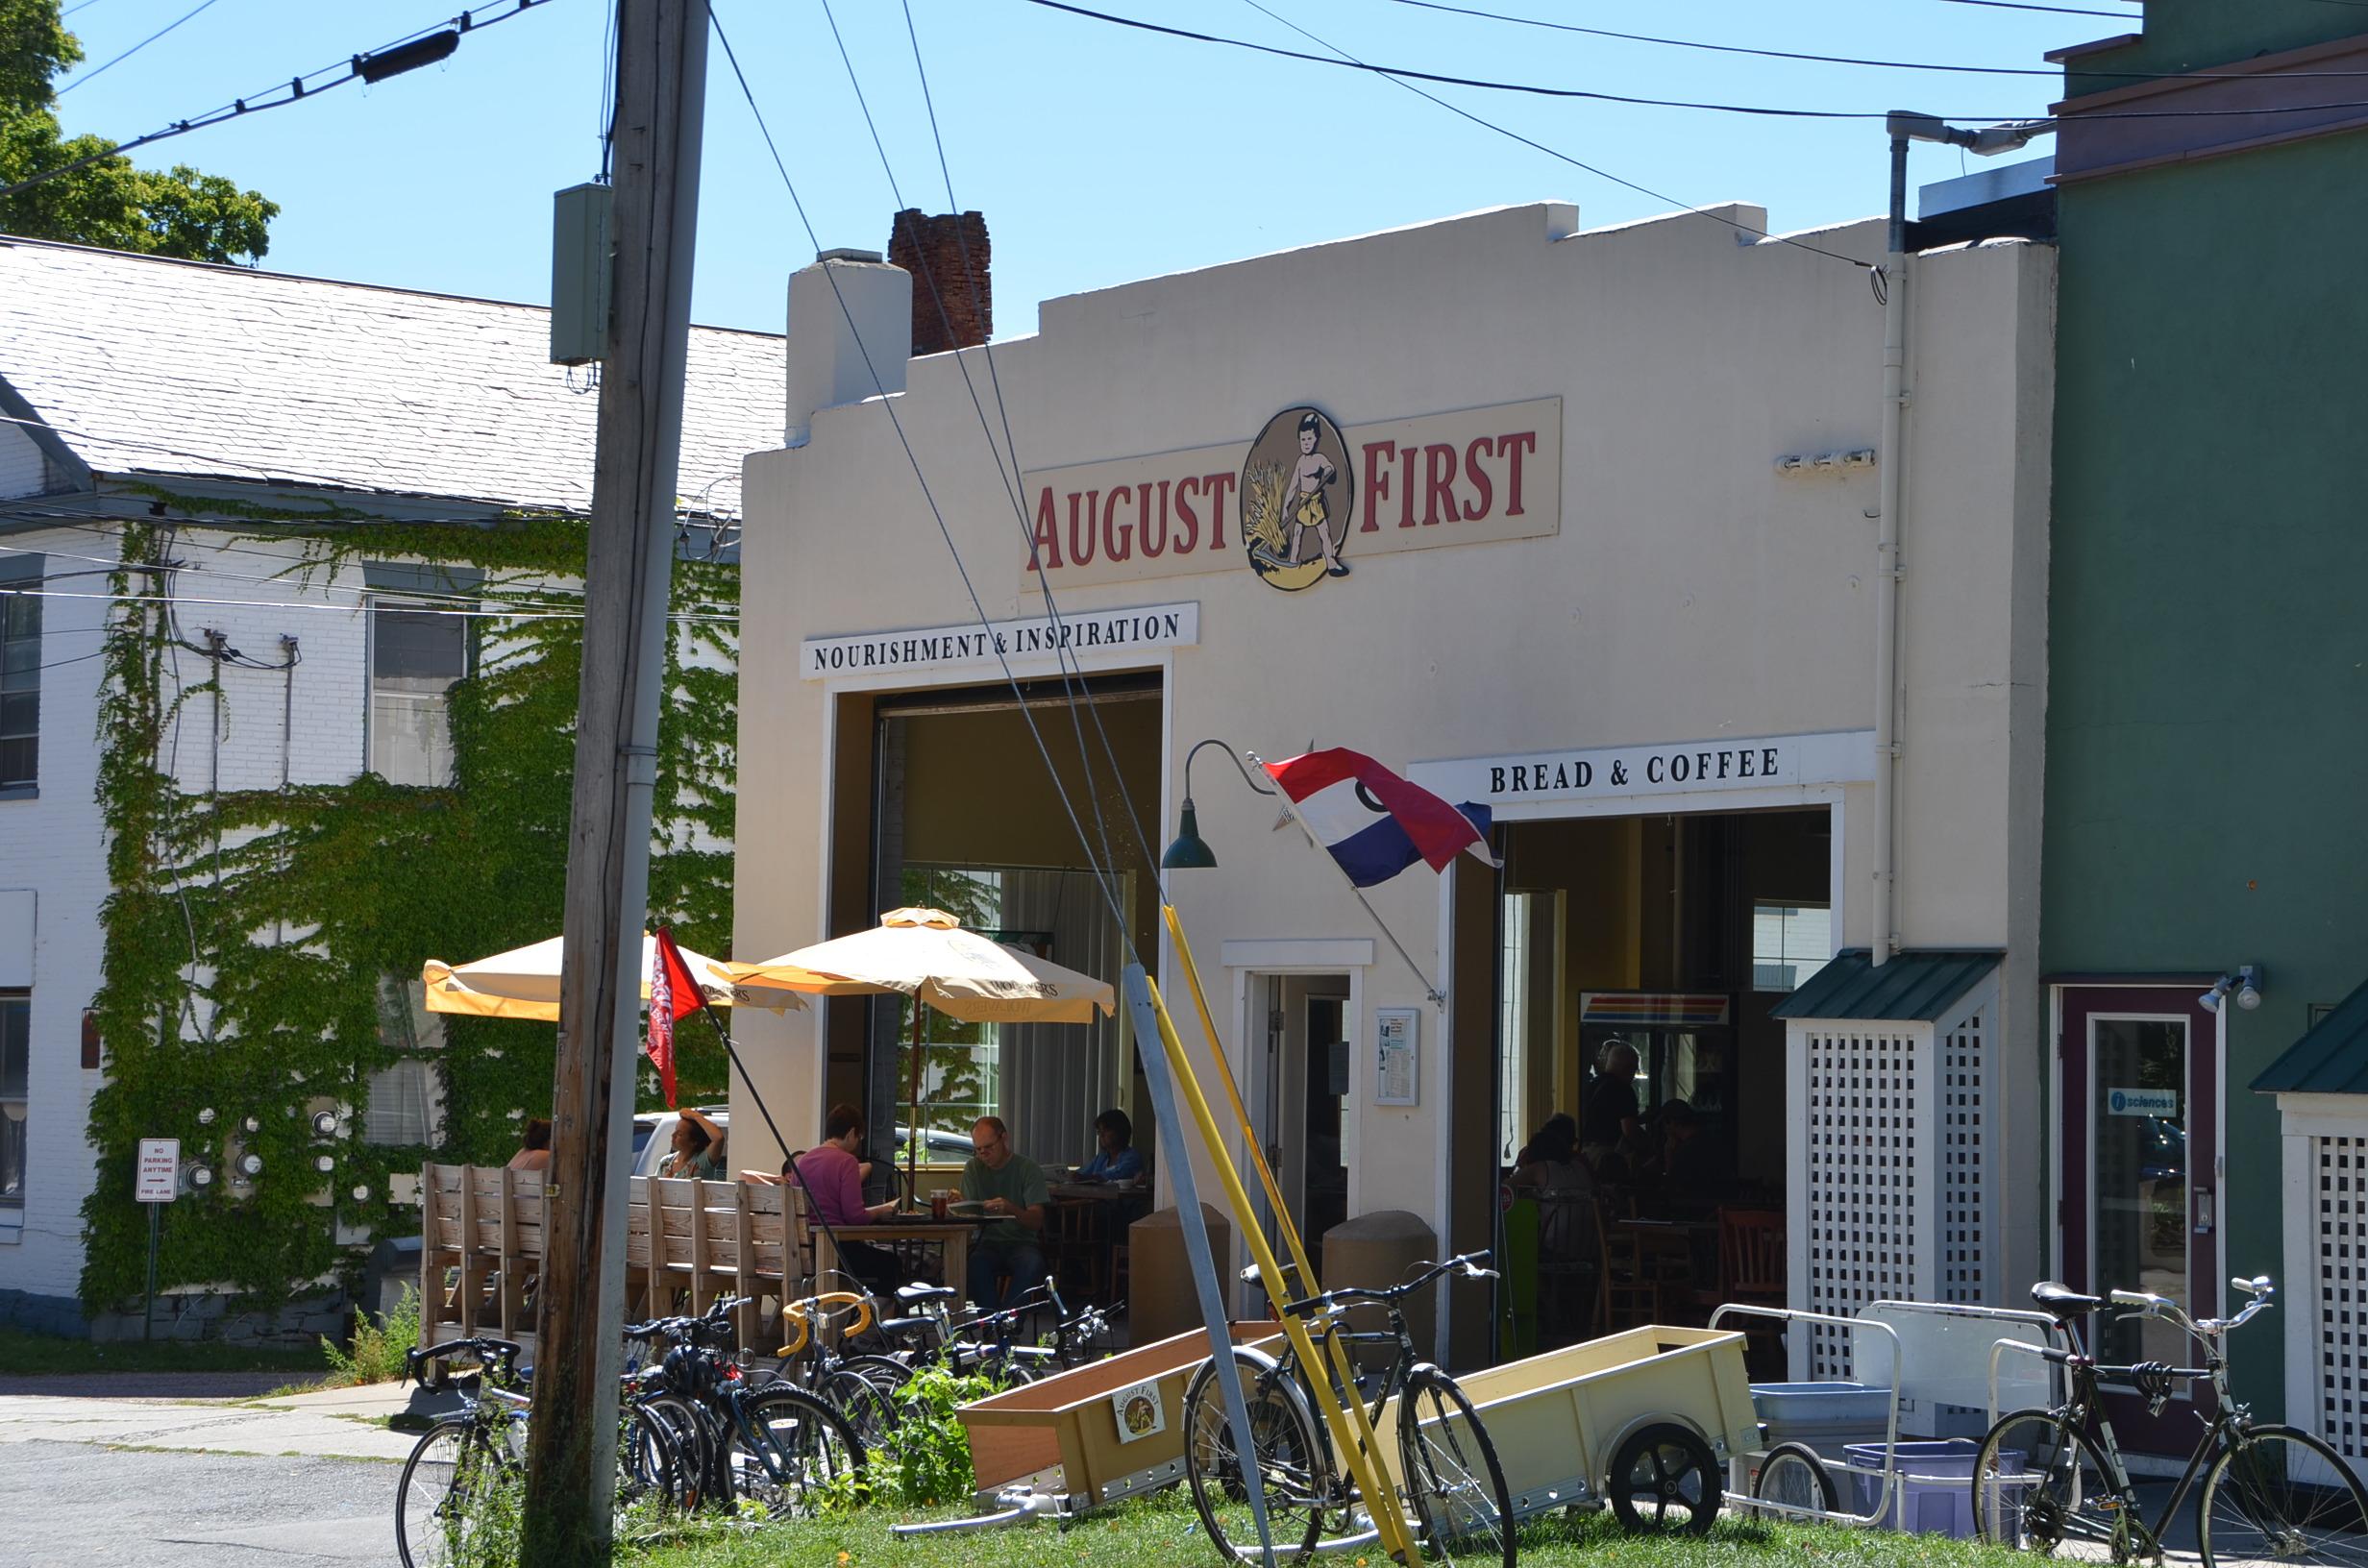 August First 1 | August First Bakery & Cafe, Burlington ...